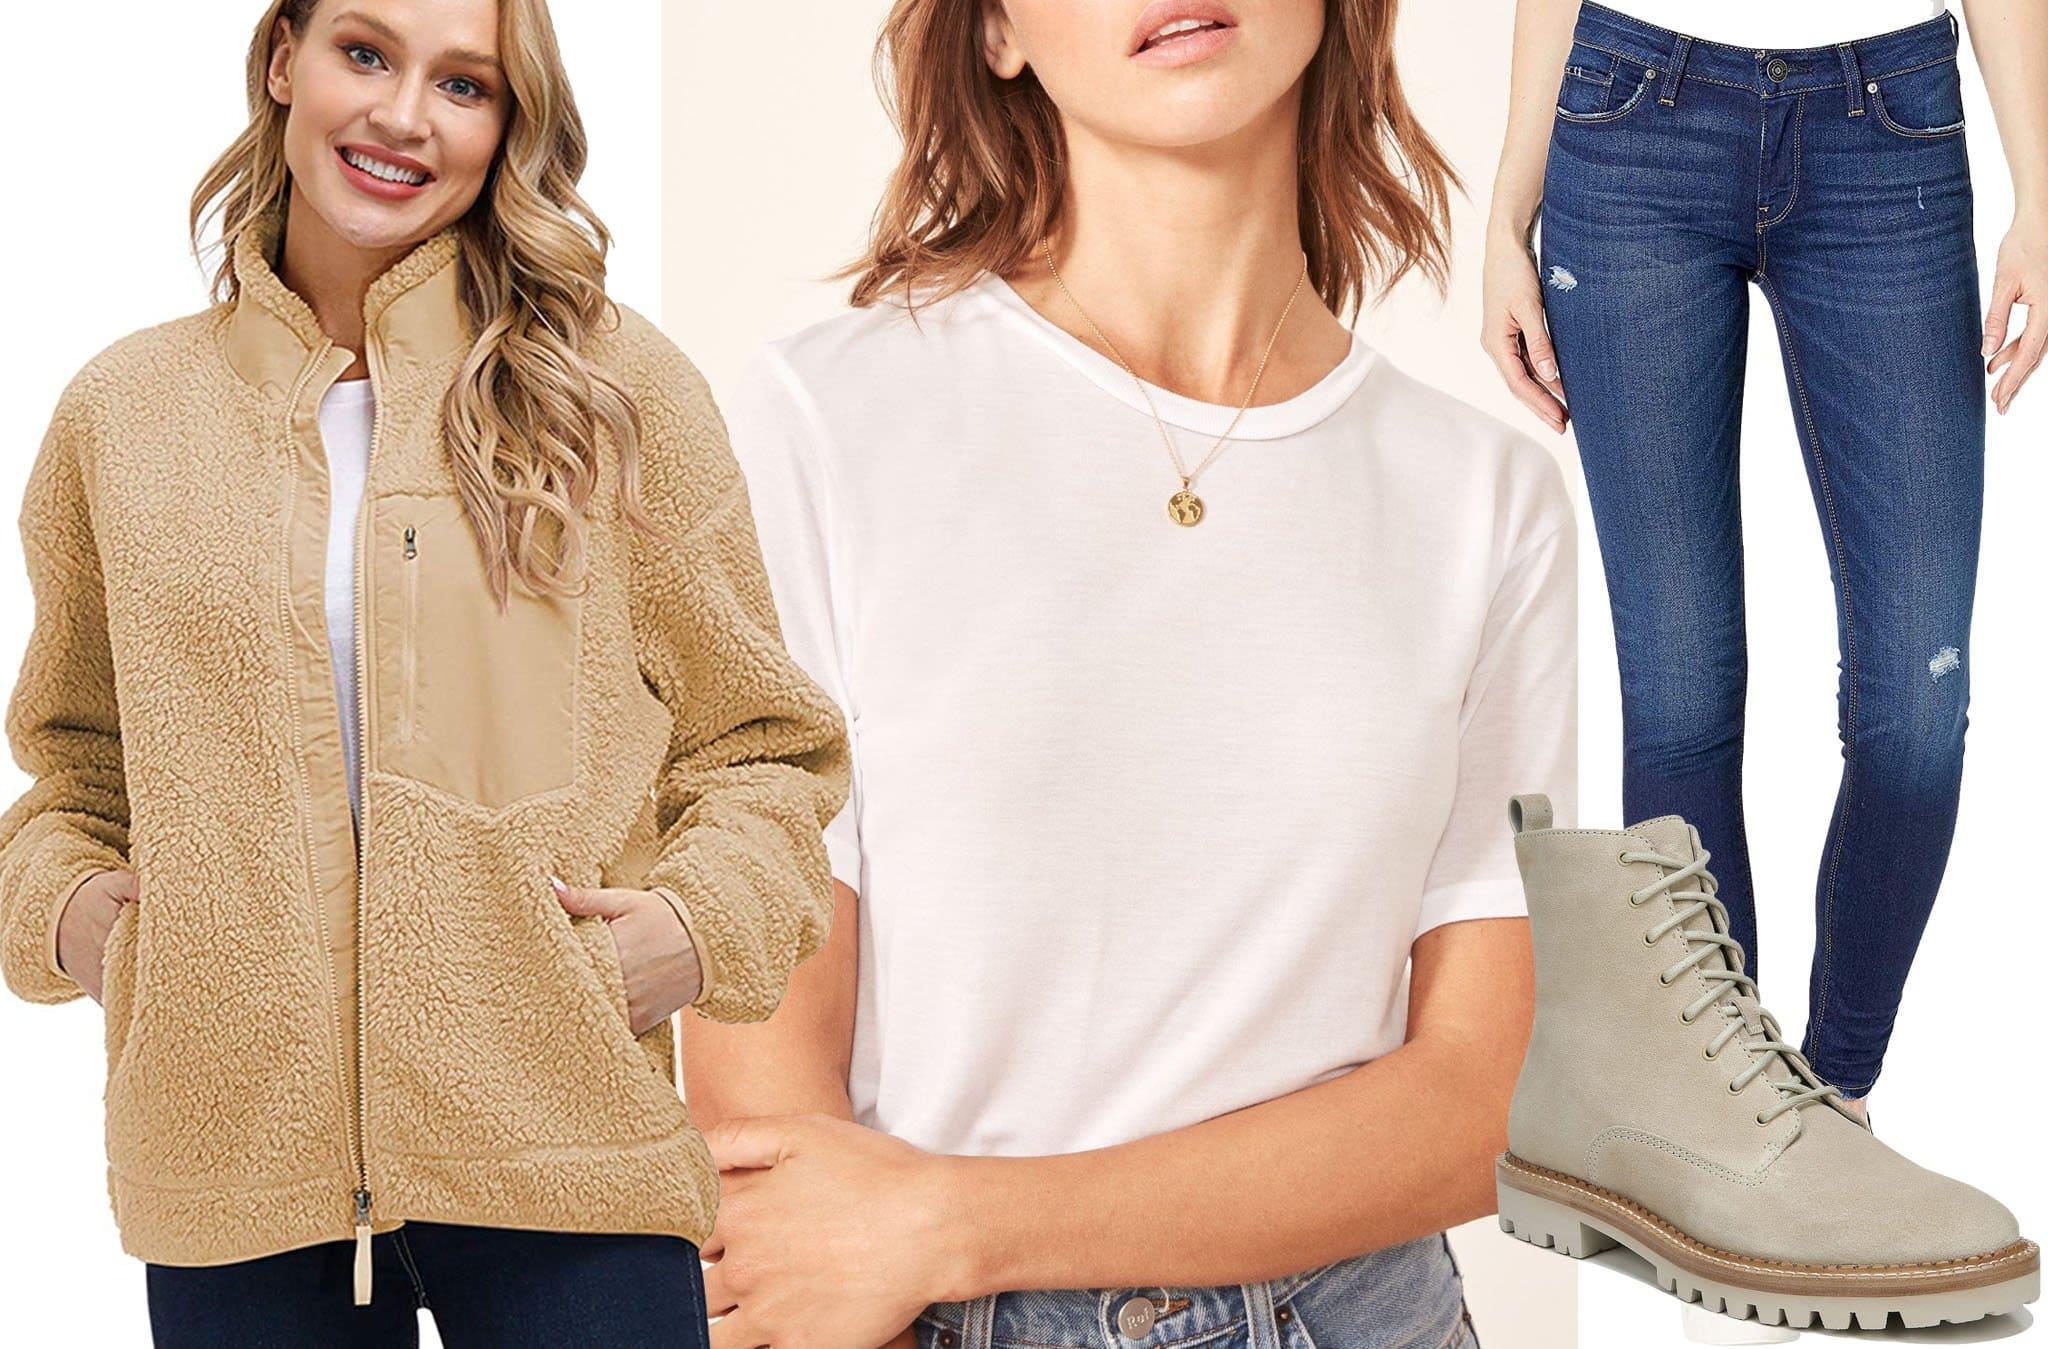 Kisscynest Women's Full Zip Fleece Jacket, Reformation Joplin Tee, Hudson Jeans Krista Mid-Rise Super Skinny in Cross Out, Vince Cabria Combat Boots